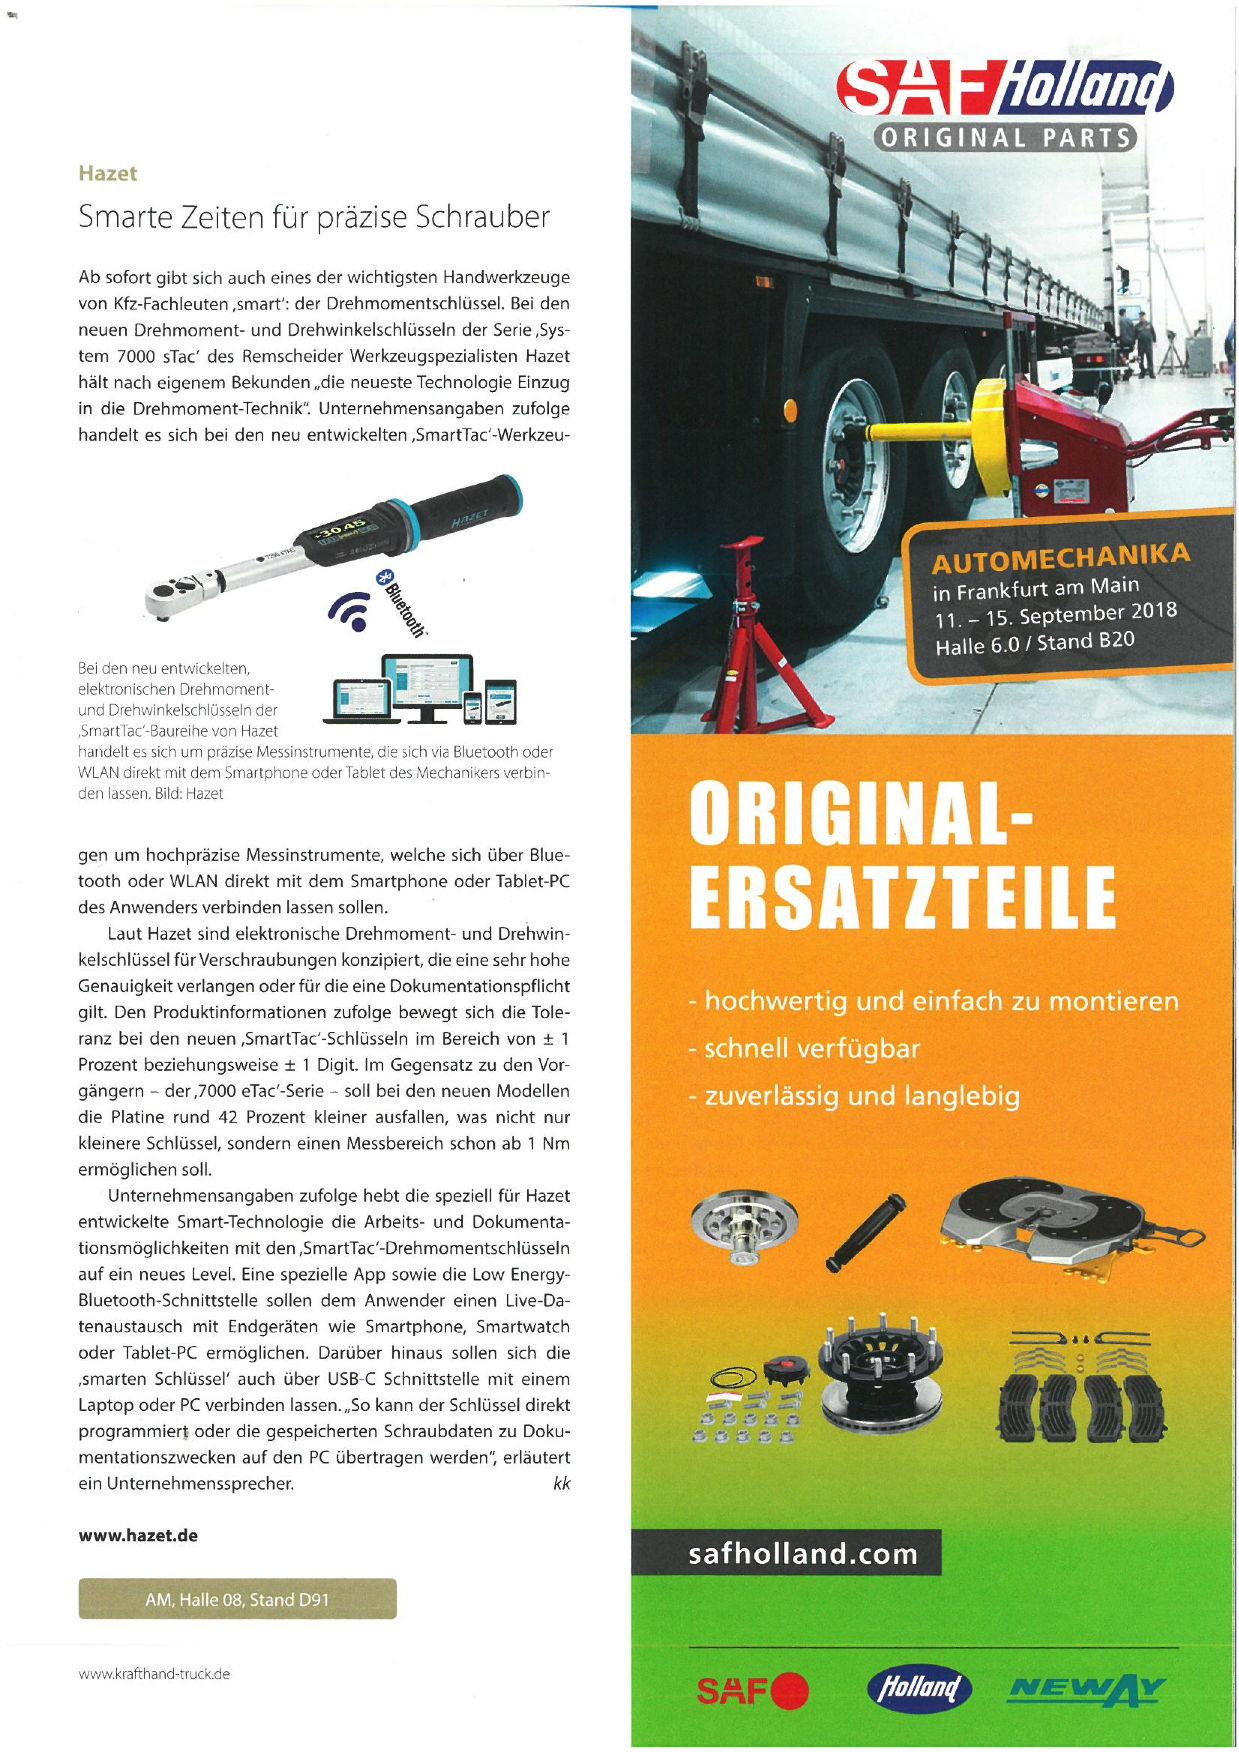 Krafthand Truck